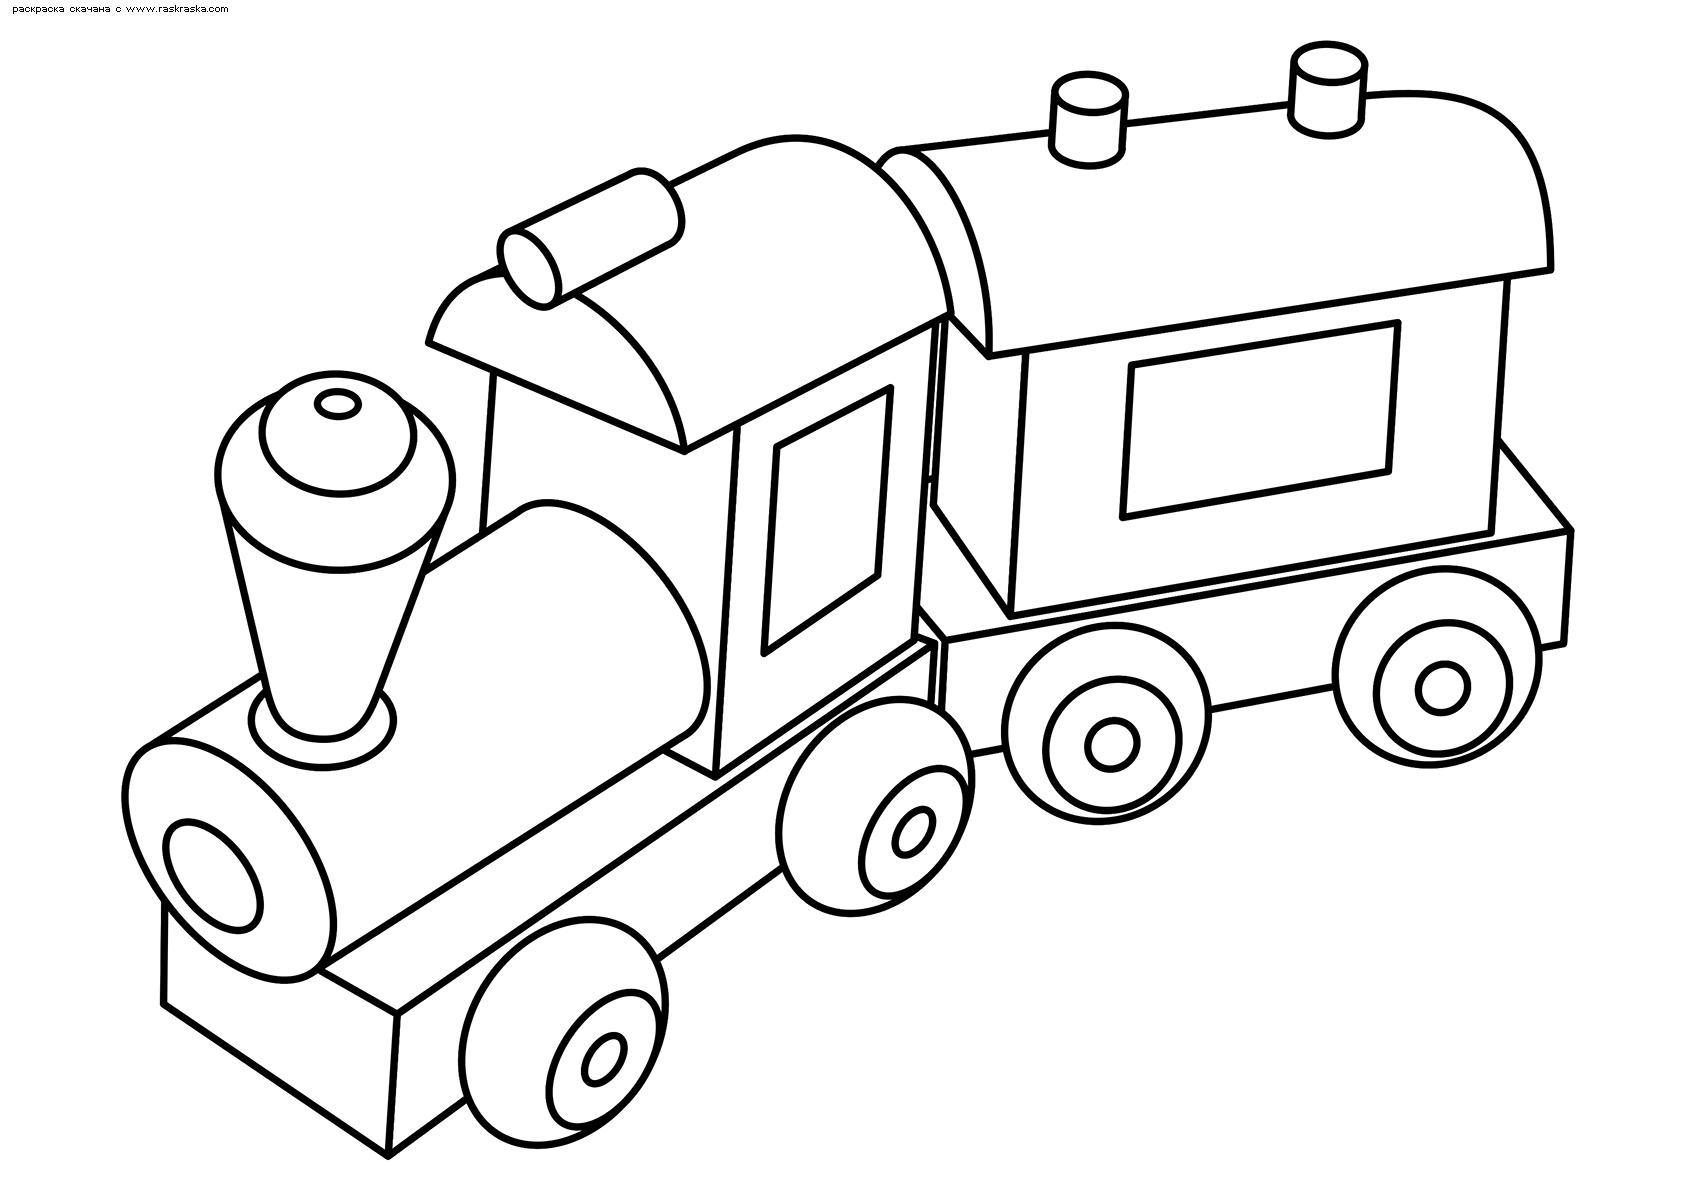 Раскраска Паровоз. Раскраска паровоз, игрушка